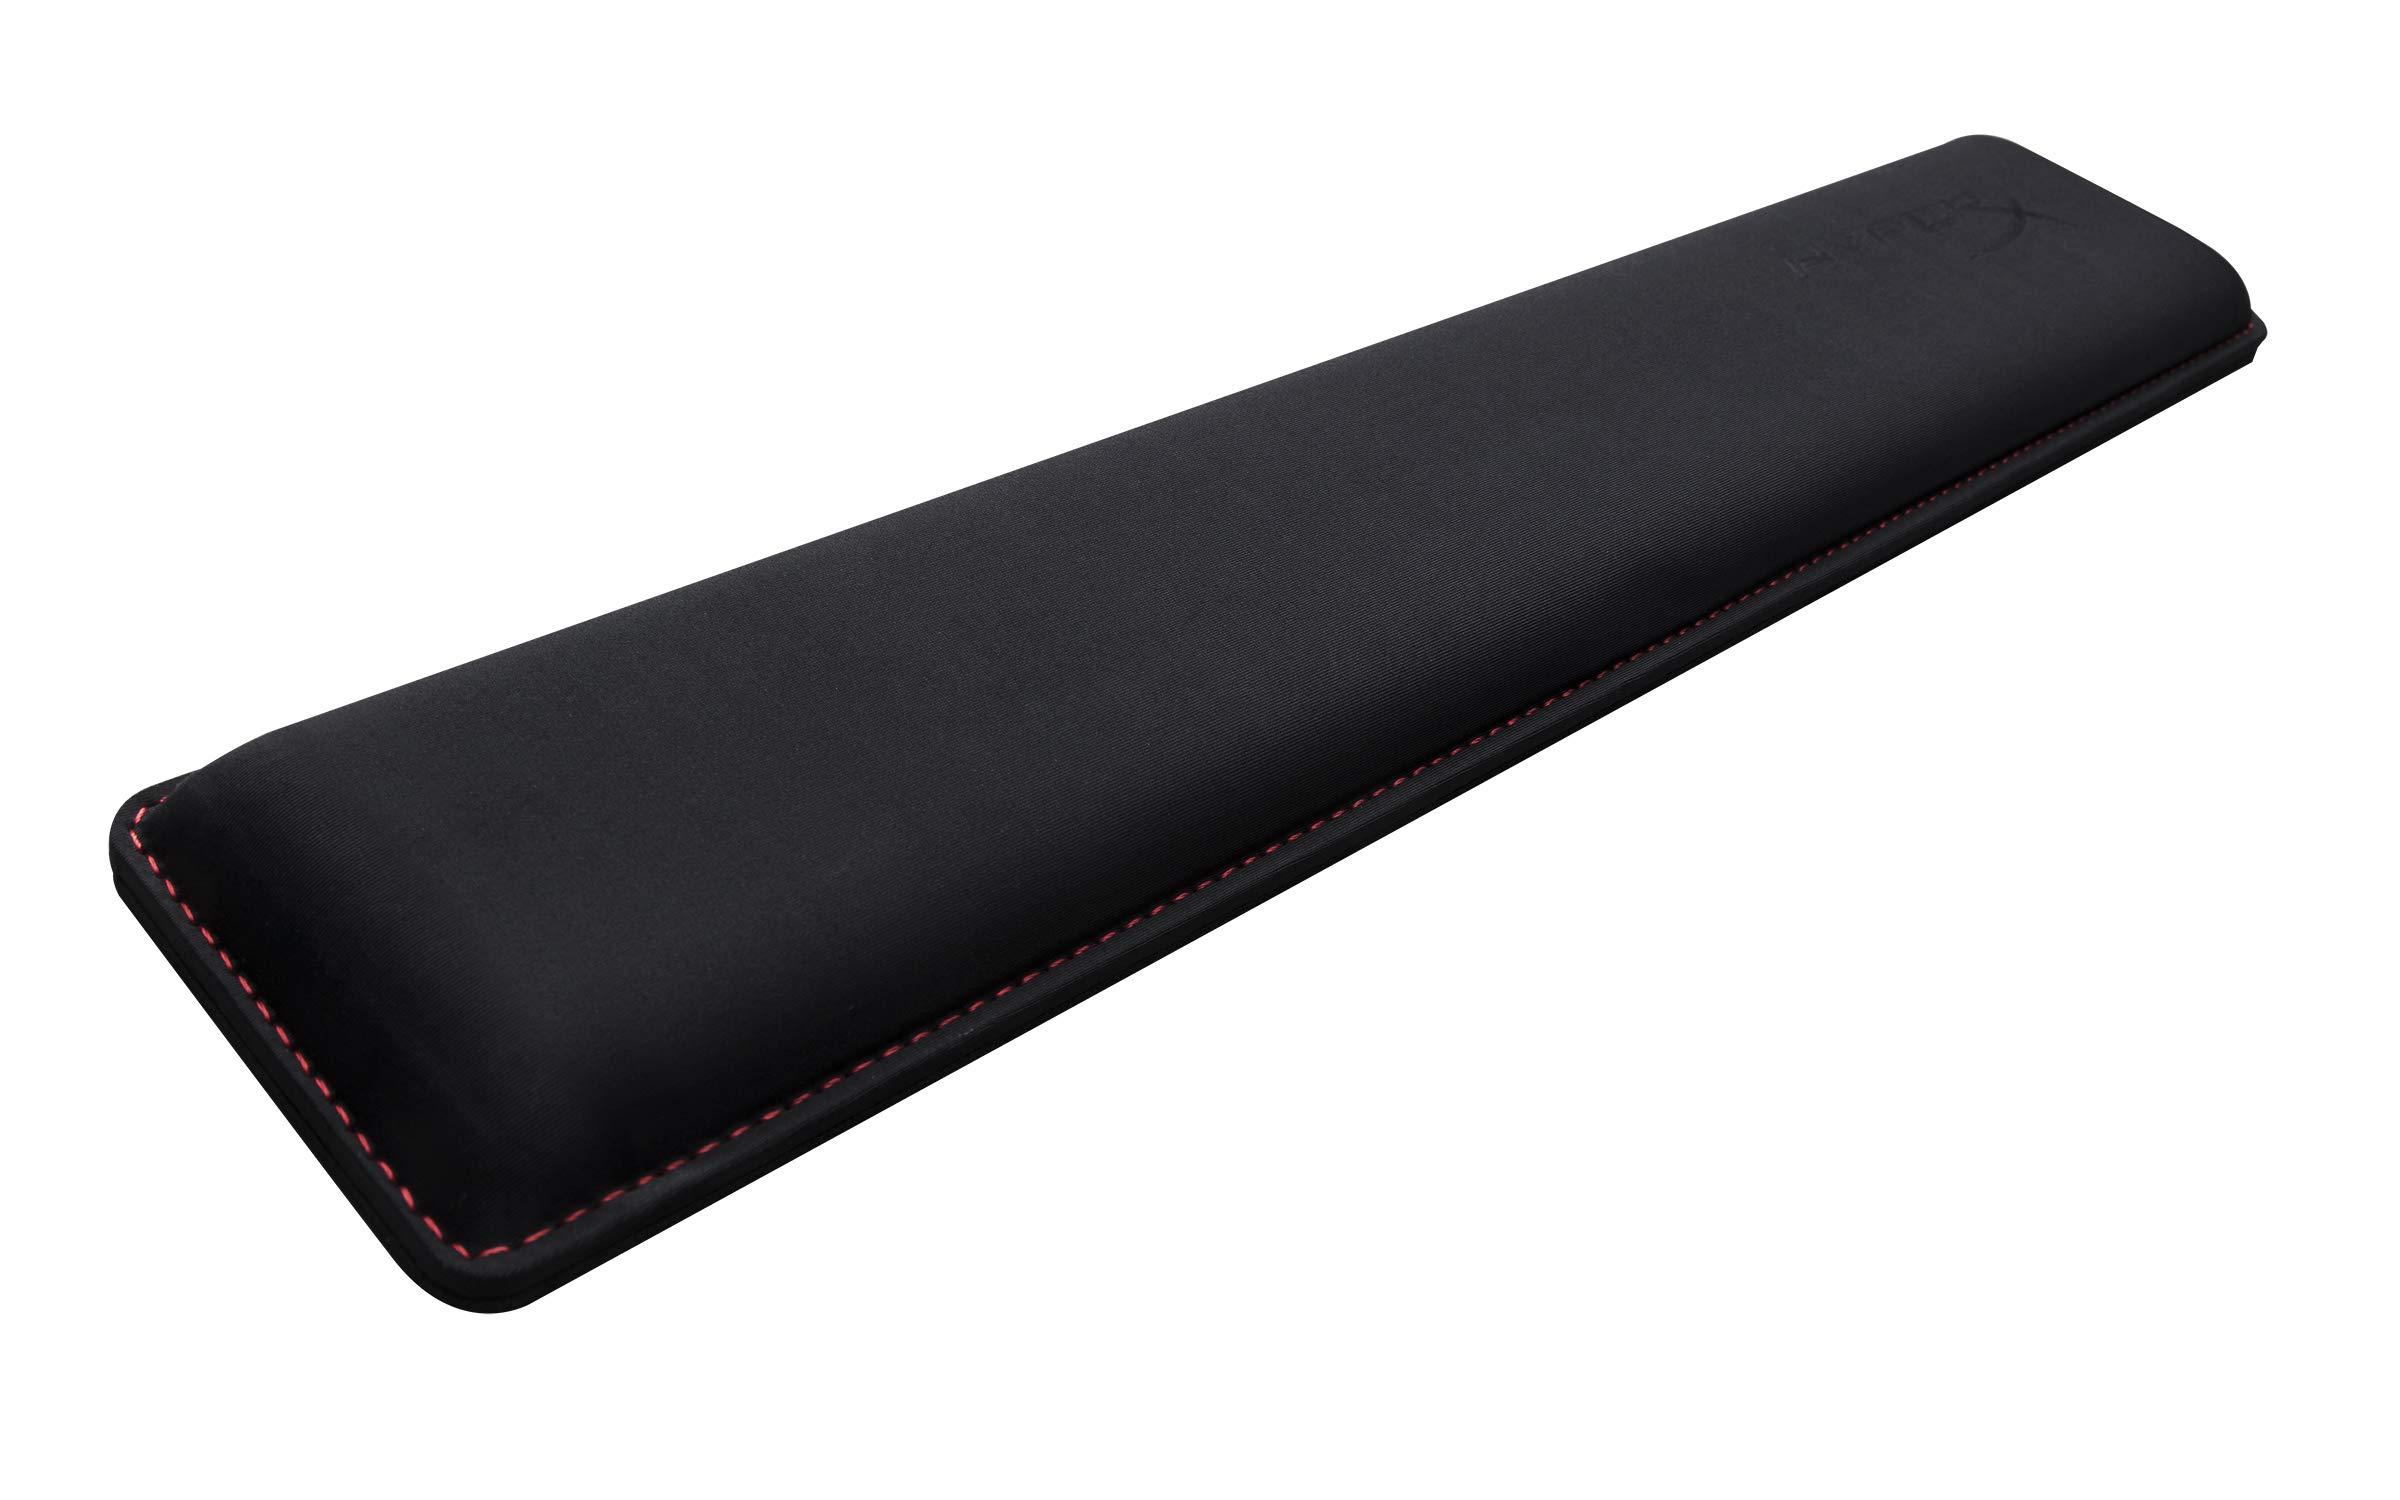 HyperX Wrist Rest Anti Slip Ergonomic